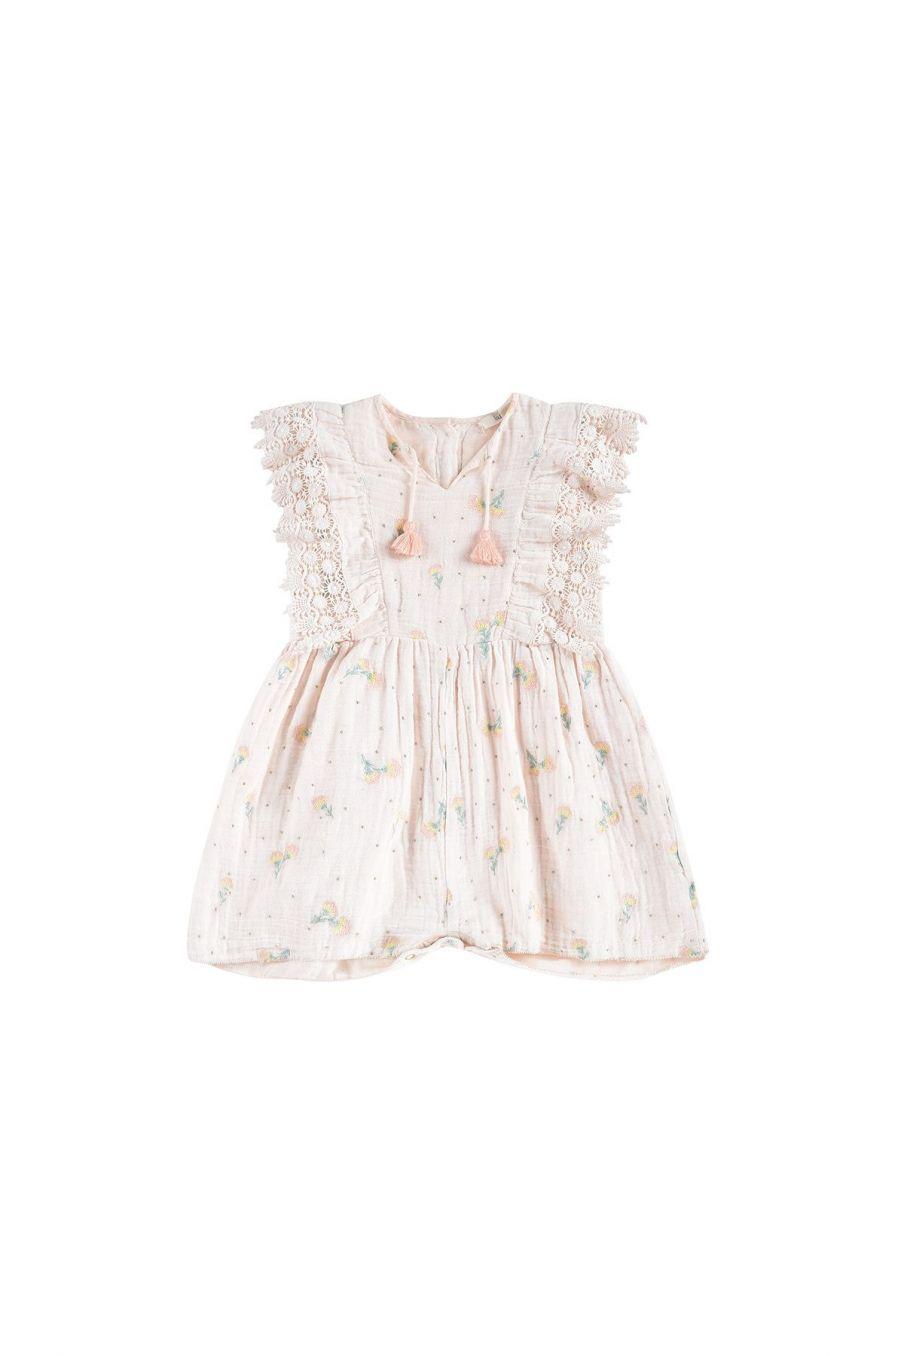 bohemian chic vintage jumpsuit girl agaro blush dandelion flowers